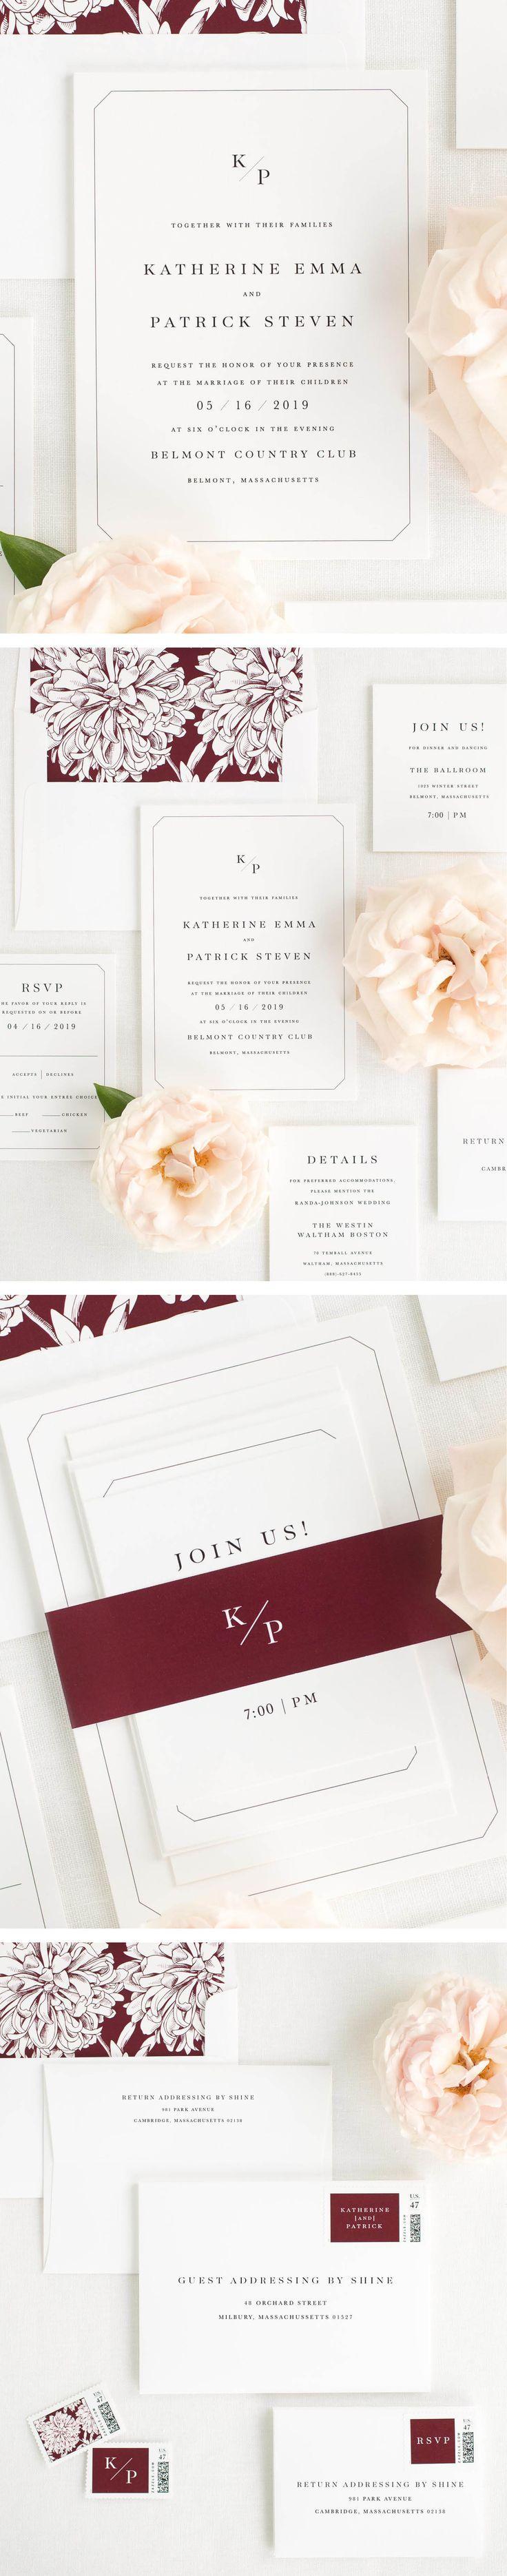 katherine wedding invitations - Modern Wedding Invitation